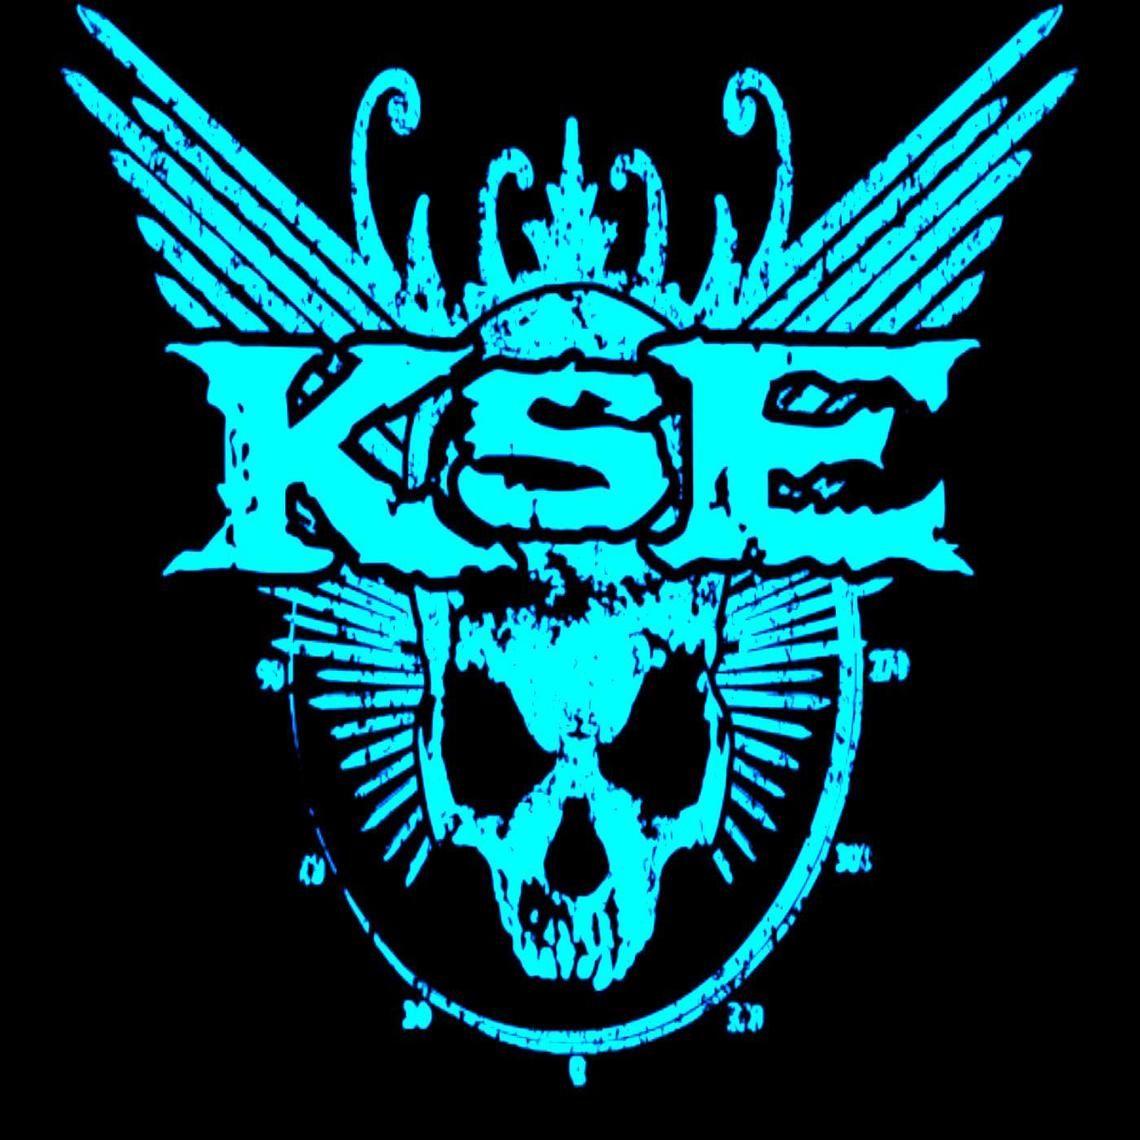 Killswitch Engage Logo | Bands | Killswitch engage, Band